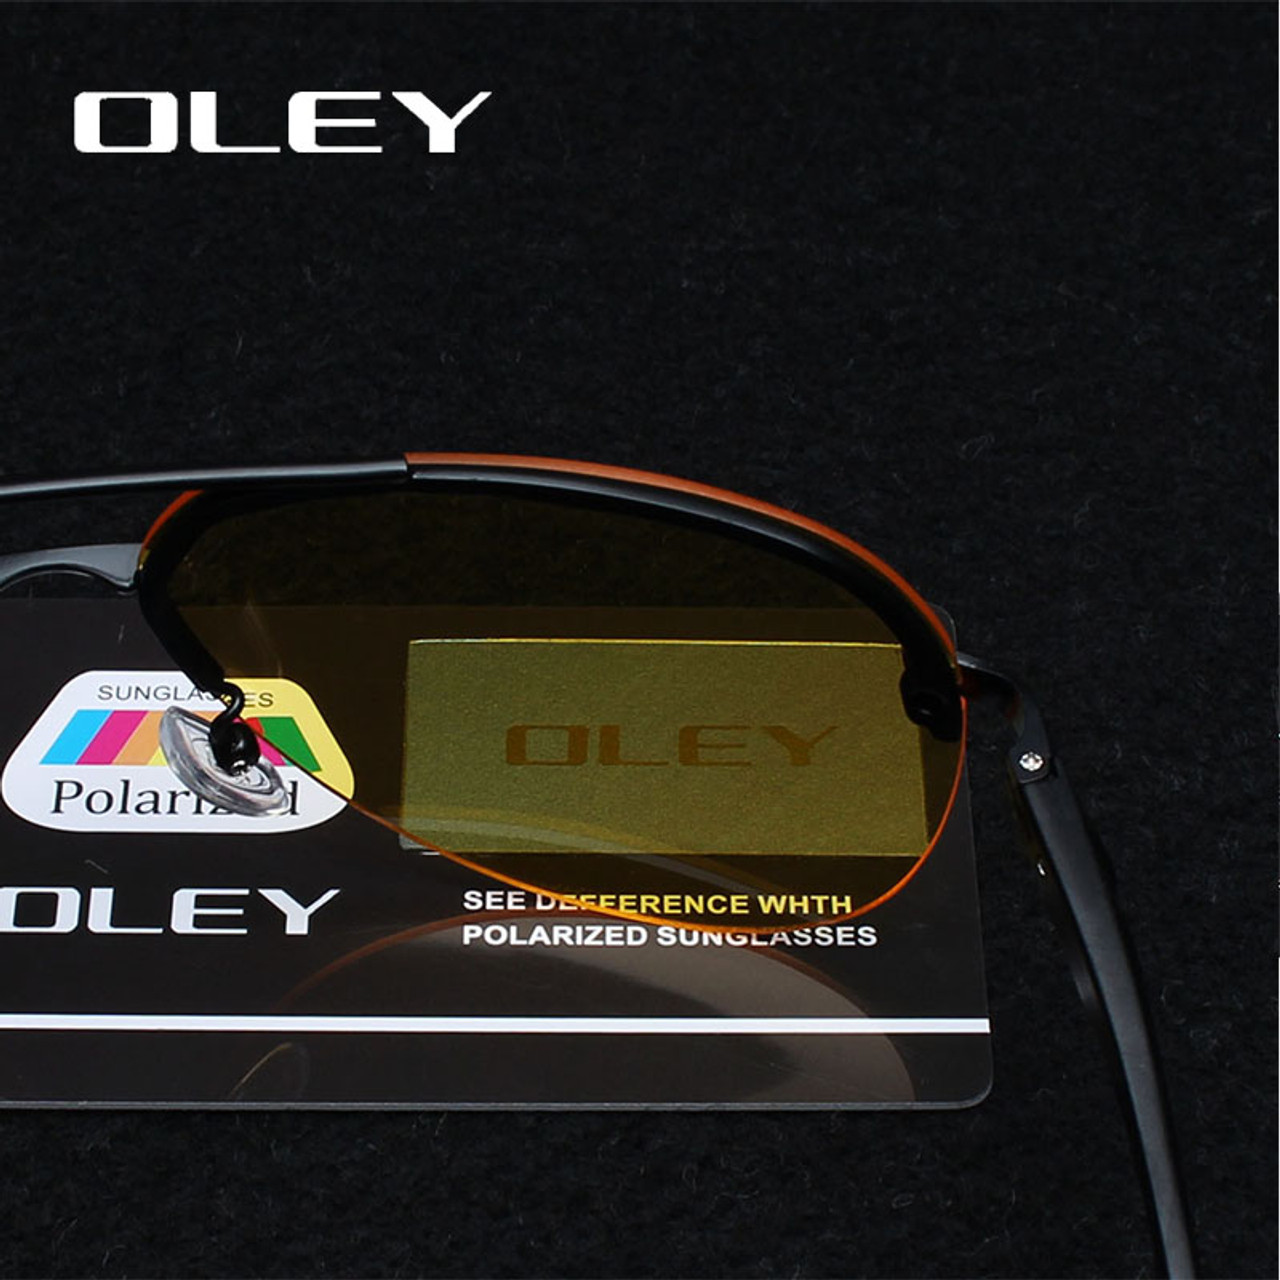 8bafcb6c1f ... OLEY Yellow Polarized Sunglasses Men night vision glasses Brand  Designer women spectacles car drivers Aviation goggles ...